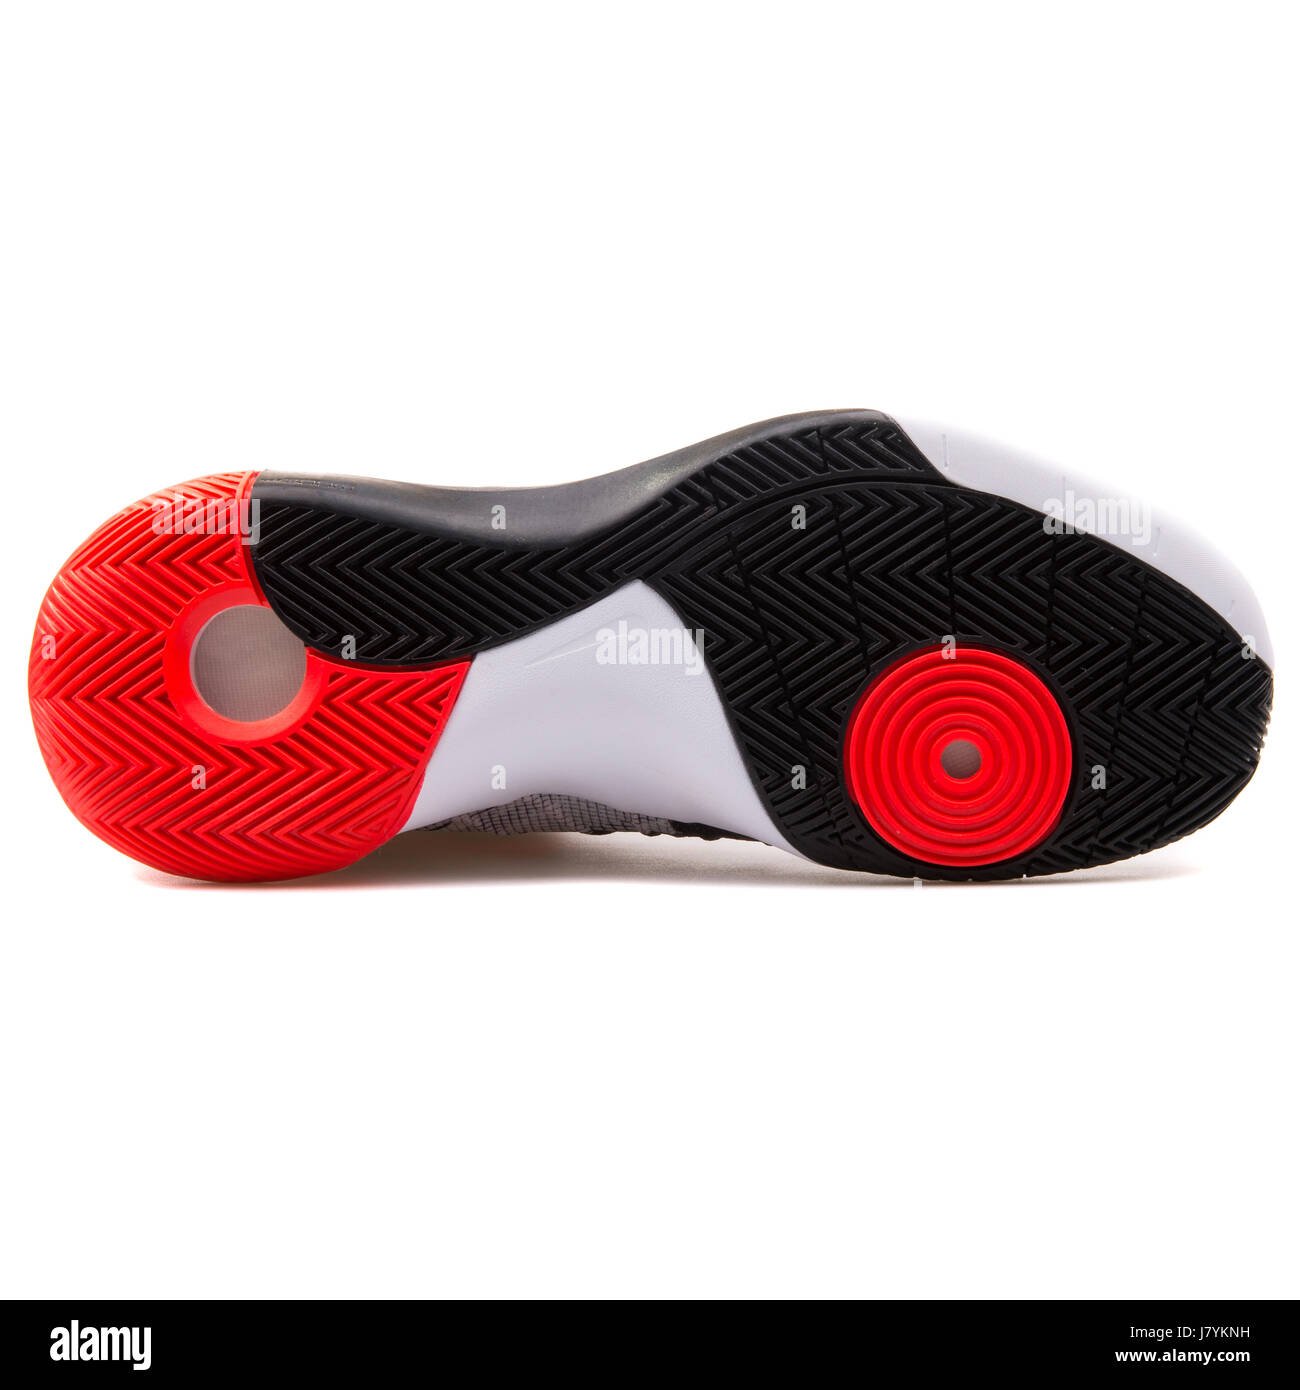 check out 63e0e 1bd85 Nike Hyperdunk 2015 PRM Men s Basketball Sneakers - 749567-160 - Stock Image